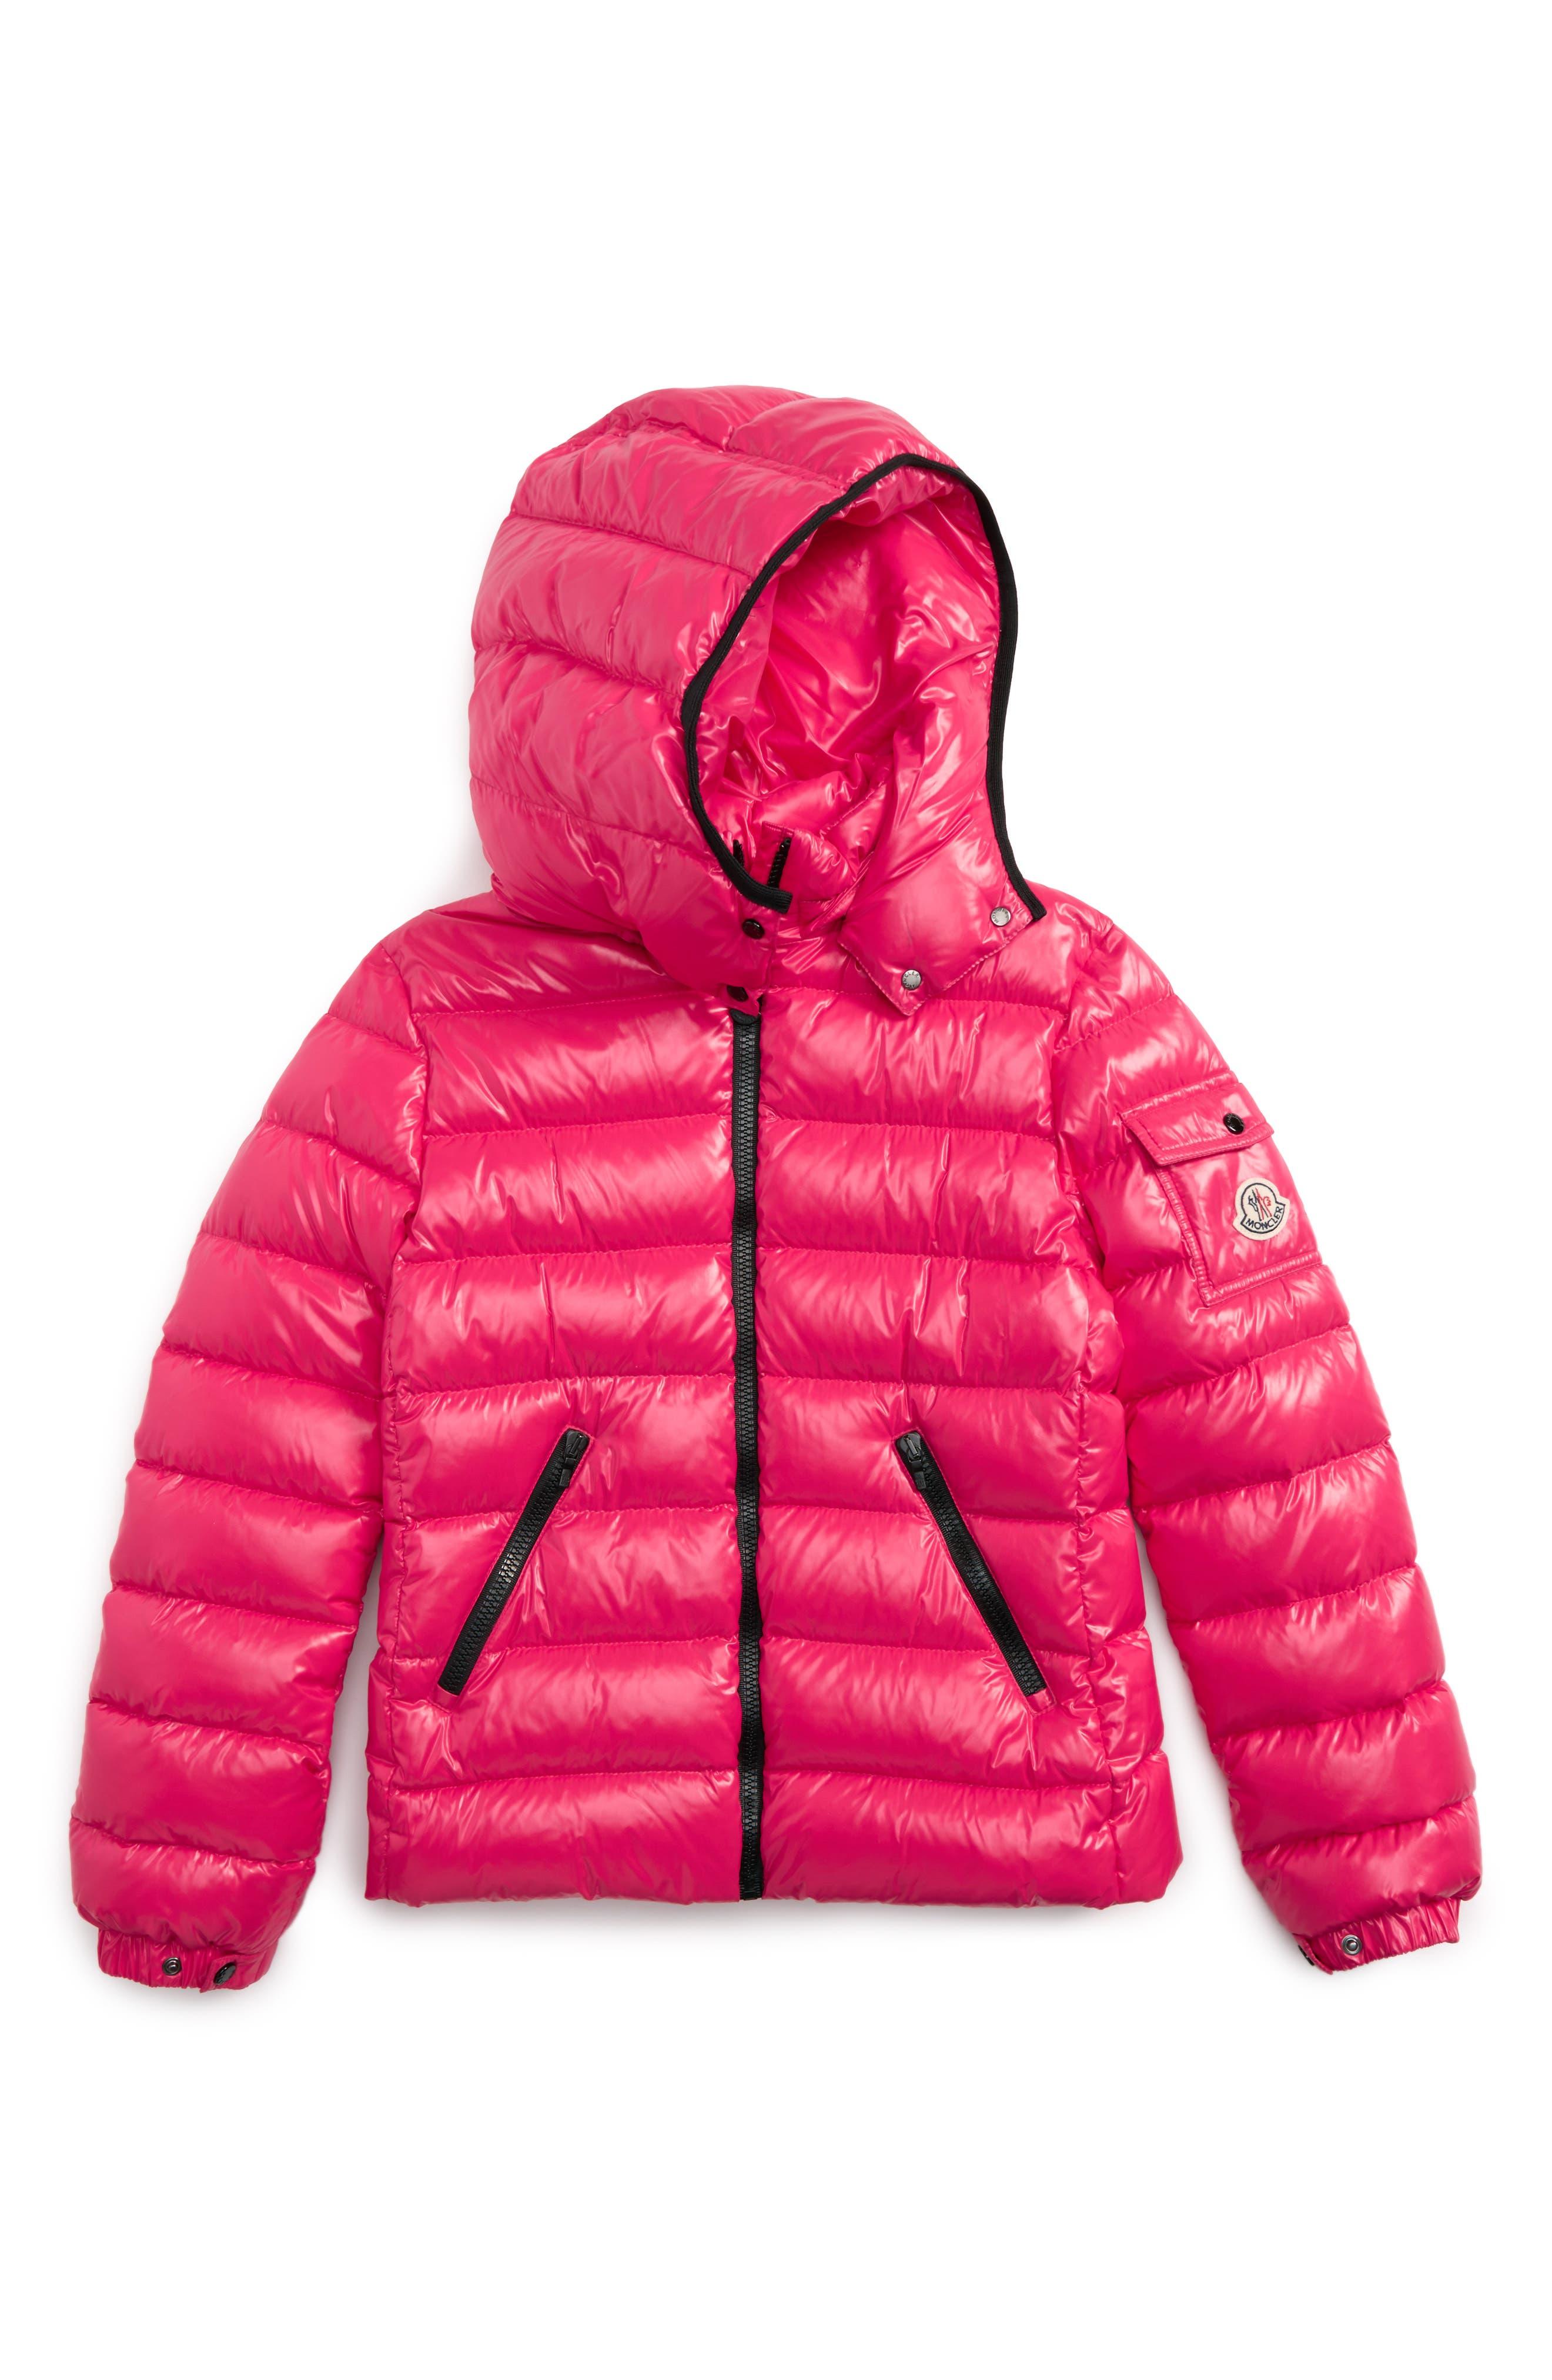 bfc6f755c Girls Down Jackets